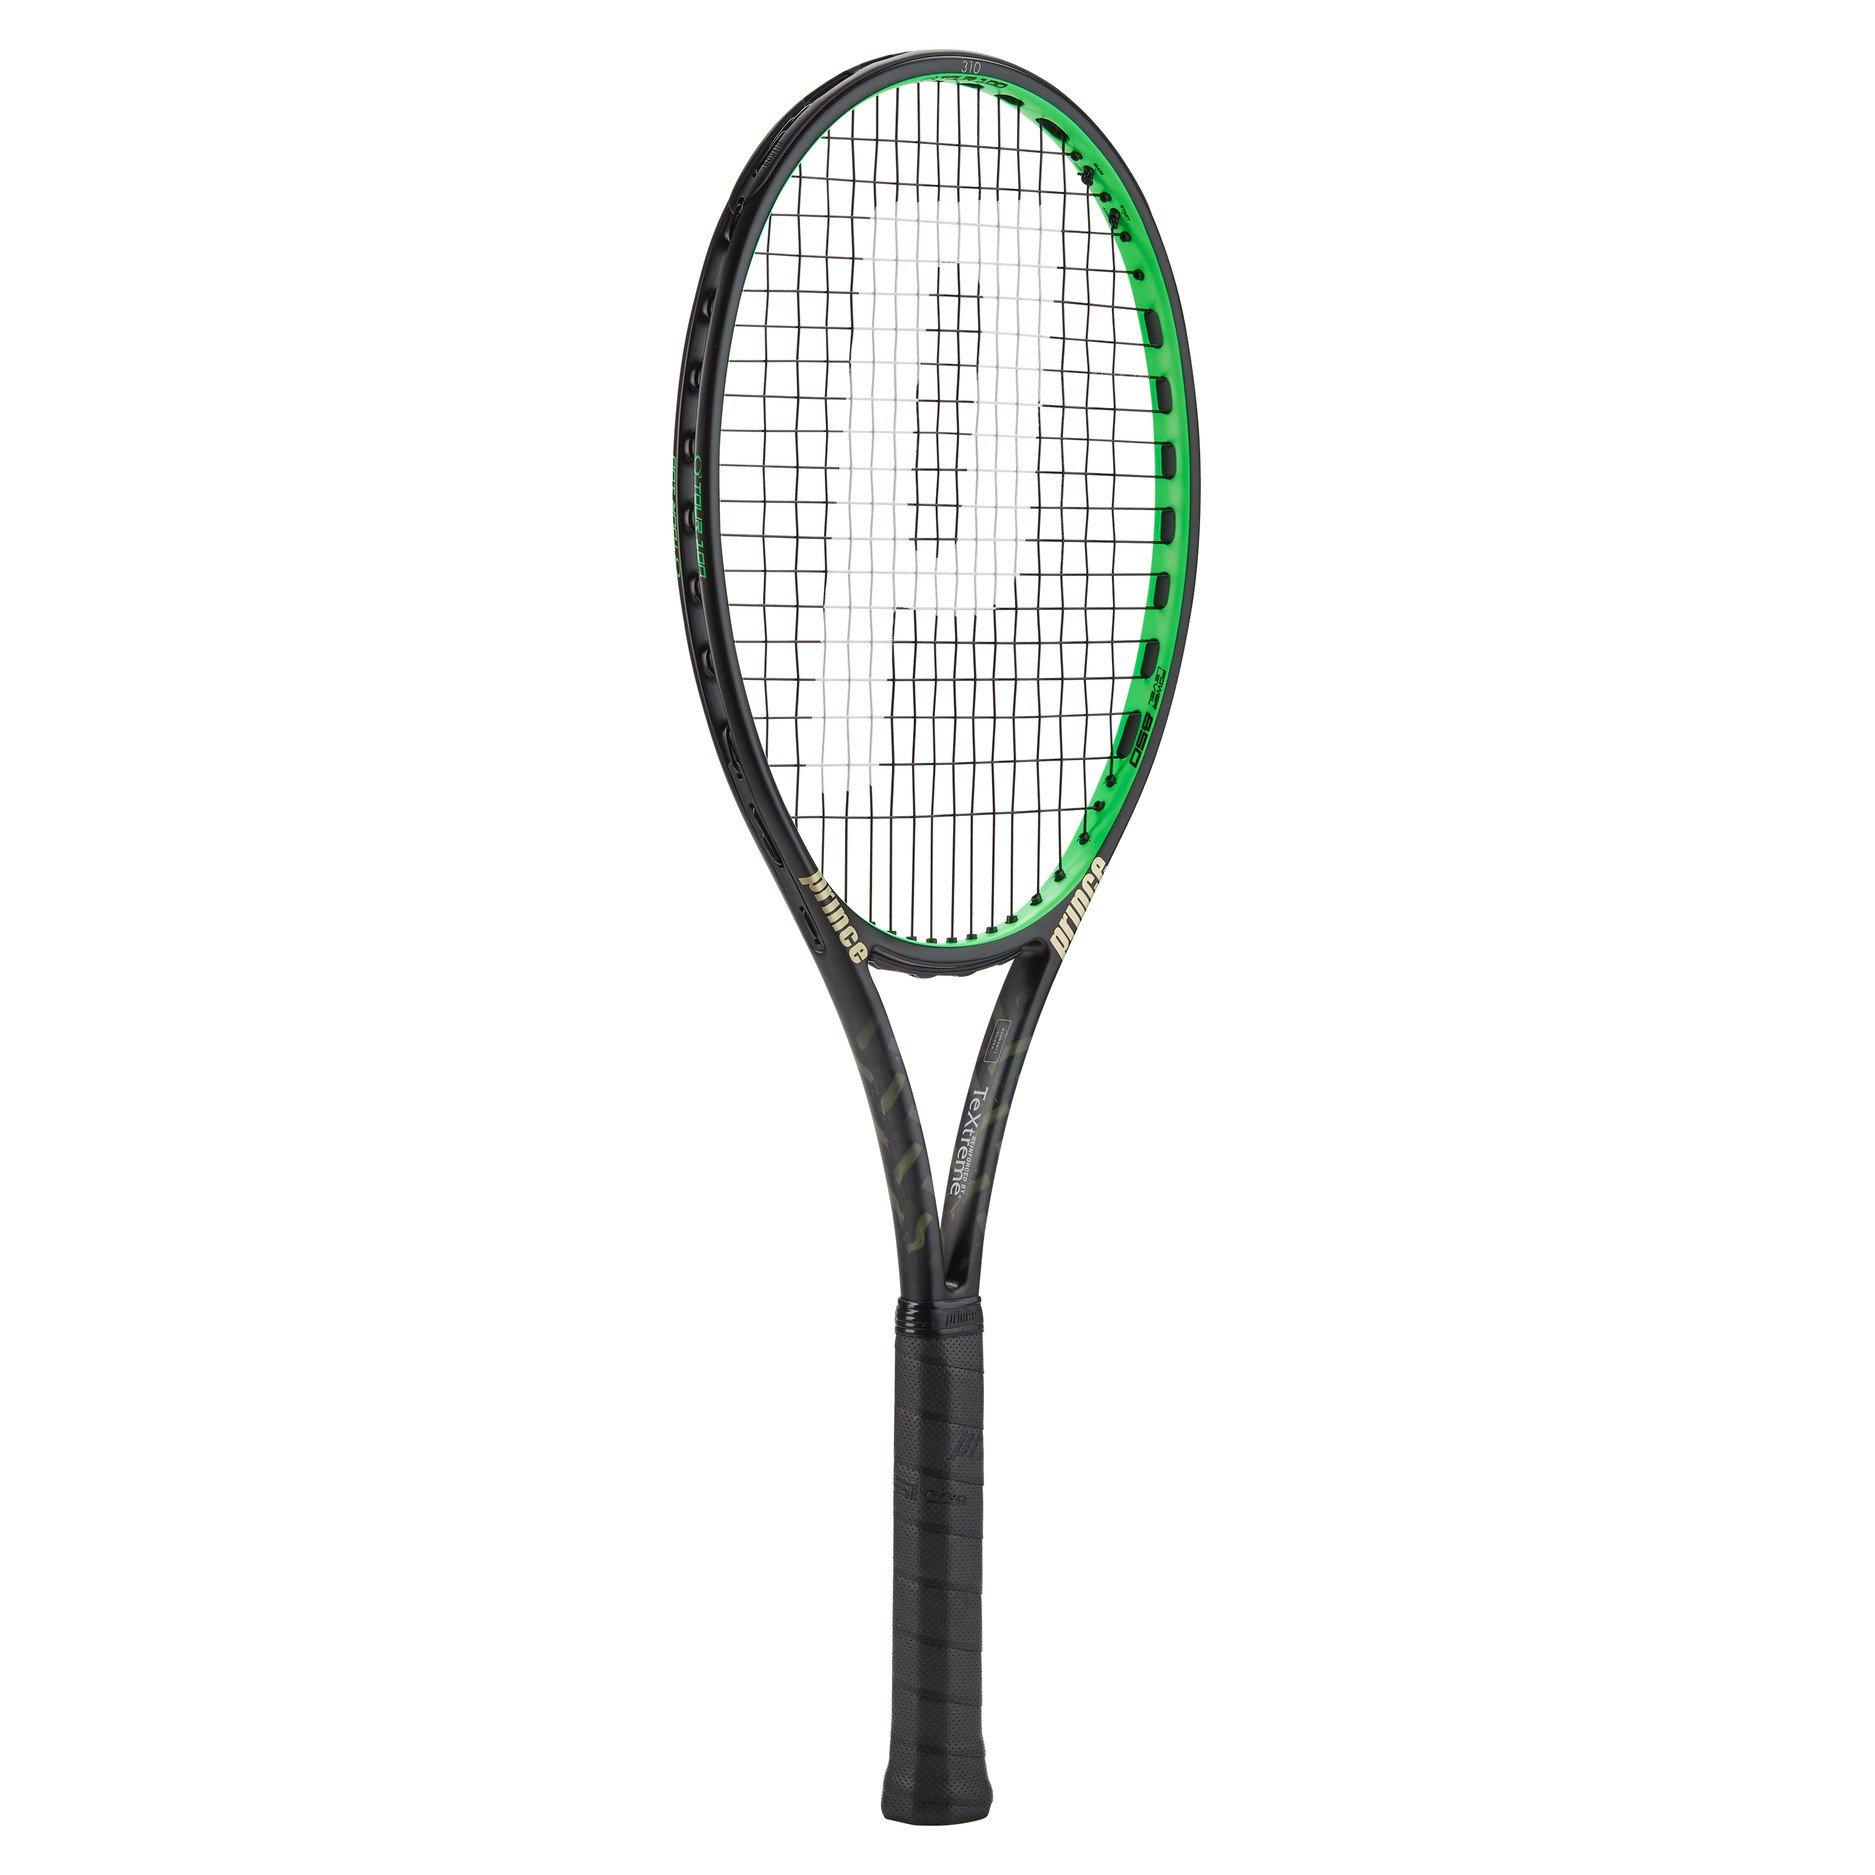 Prince Tennis Racket – O3 Tour 100 (310g)